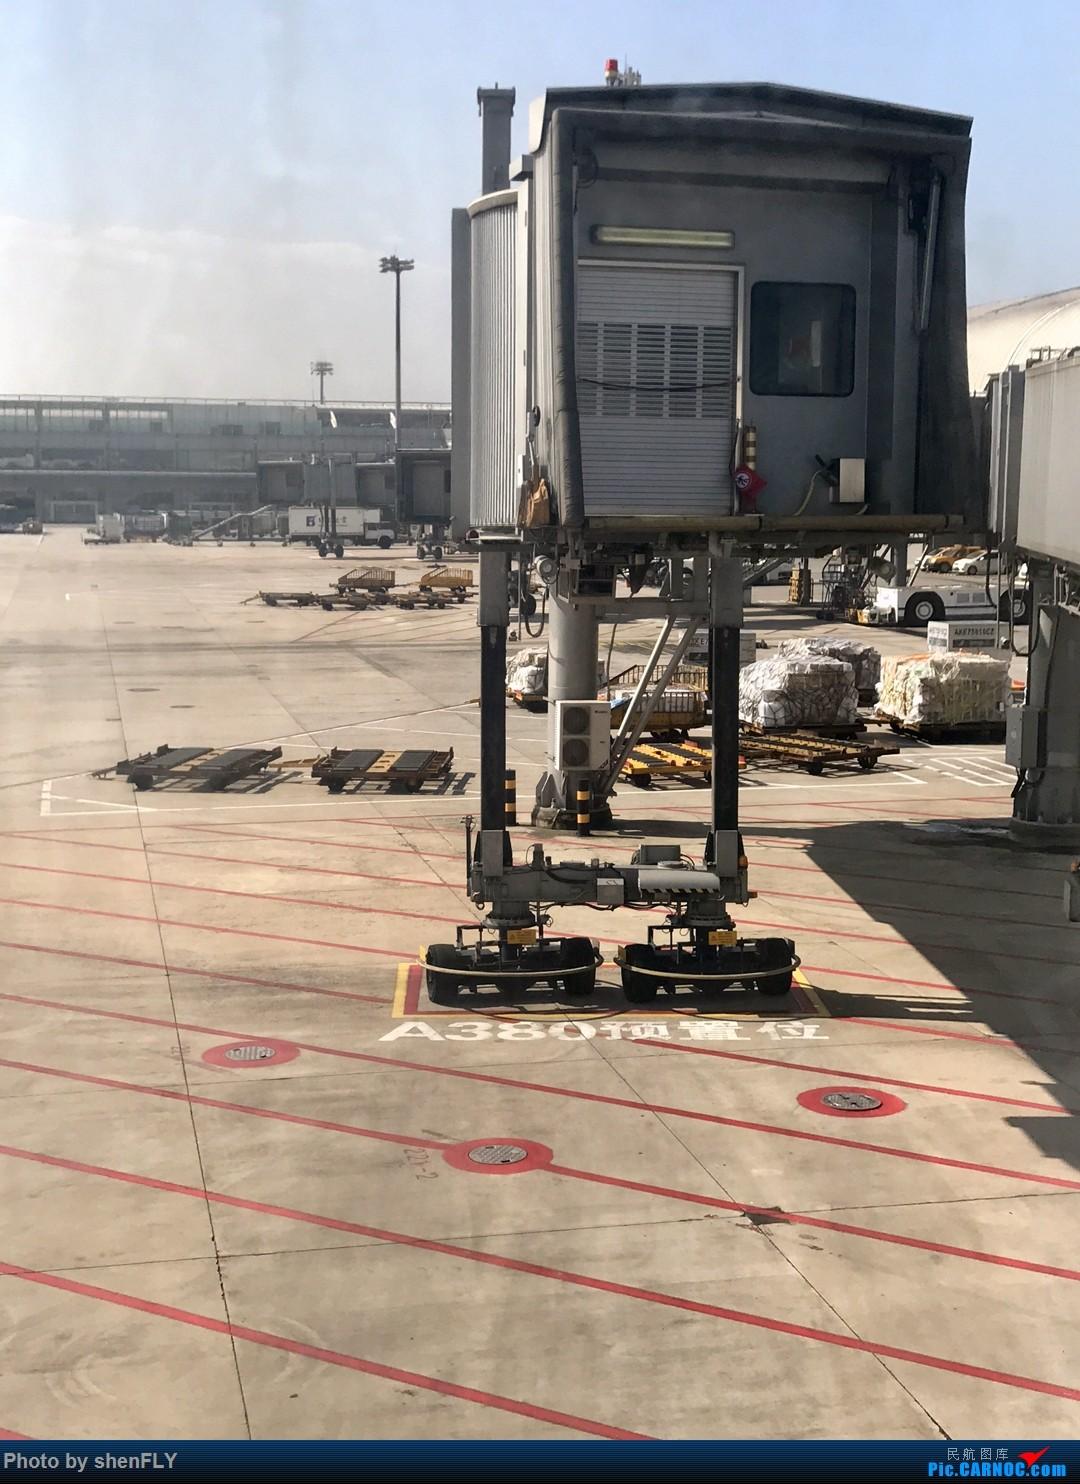 Re:[原创]***【南航A380】CZ3000 PEK-CAN 明星航班的超凡体验回忆 *** AIRBUS A380 B-6139 中国北京首都国际机场 中国北京首都国际机场